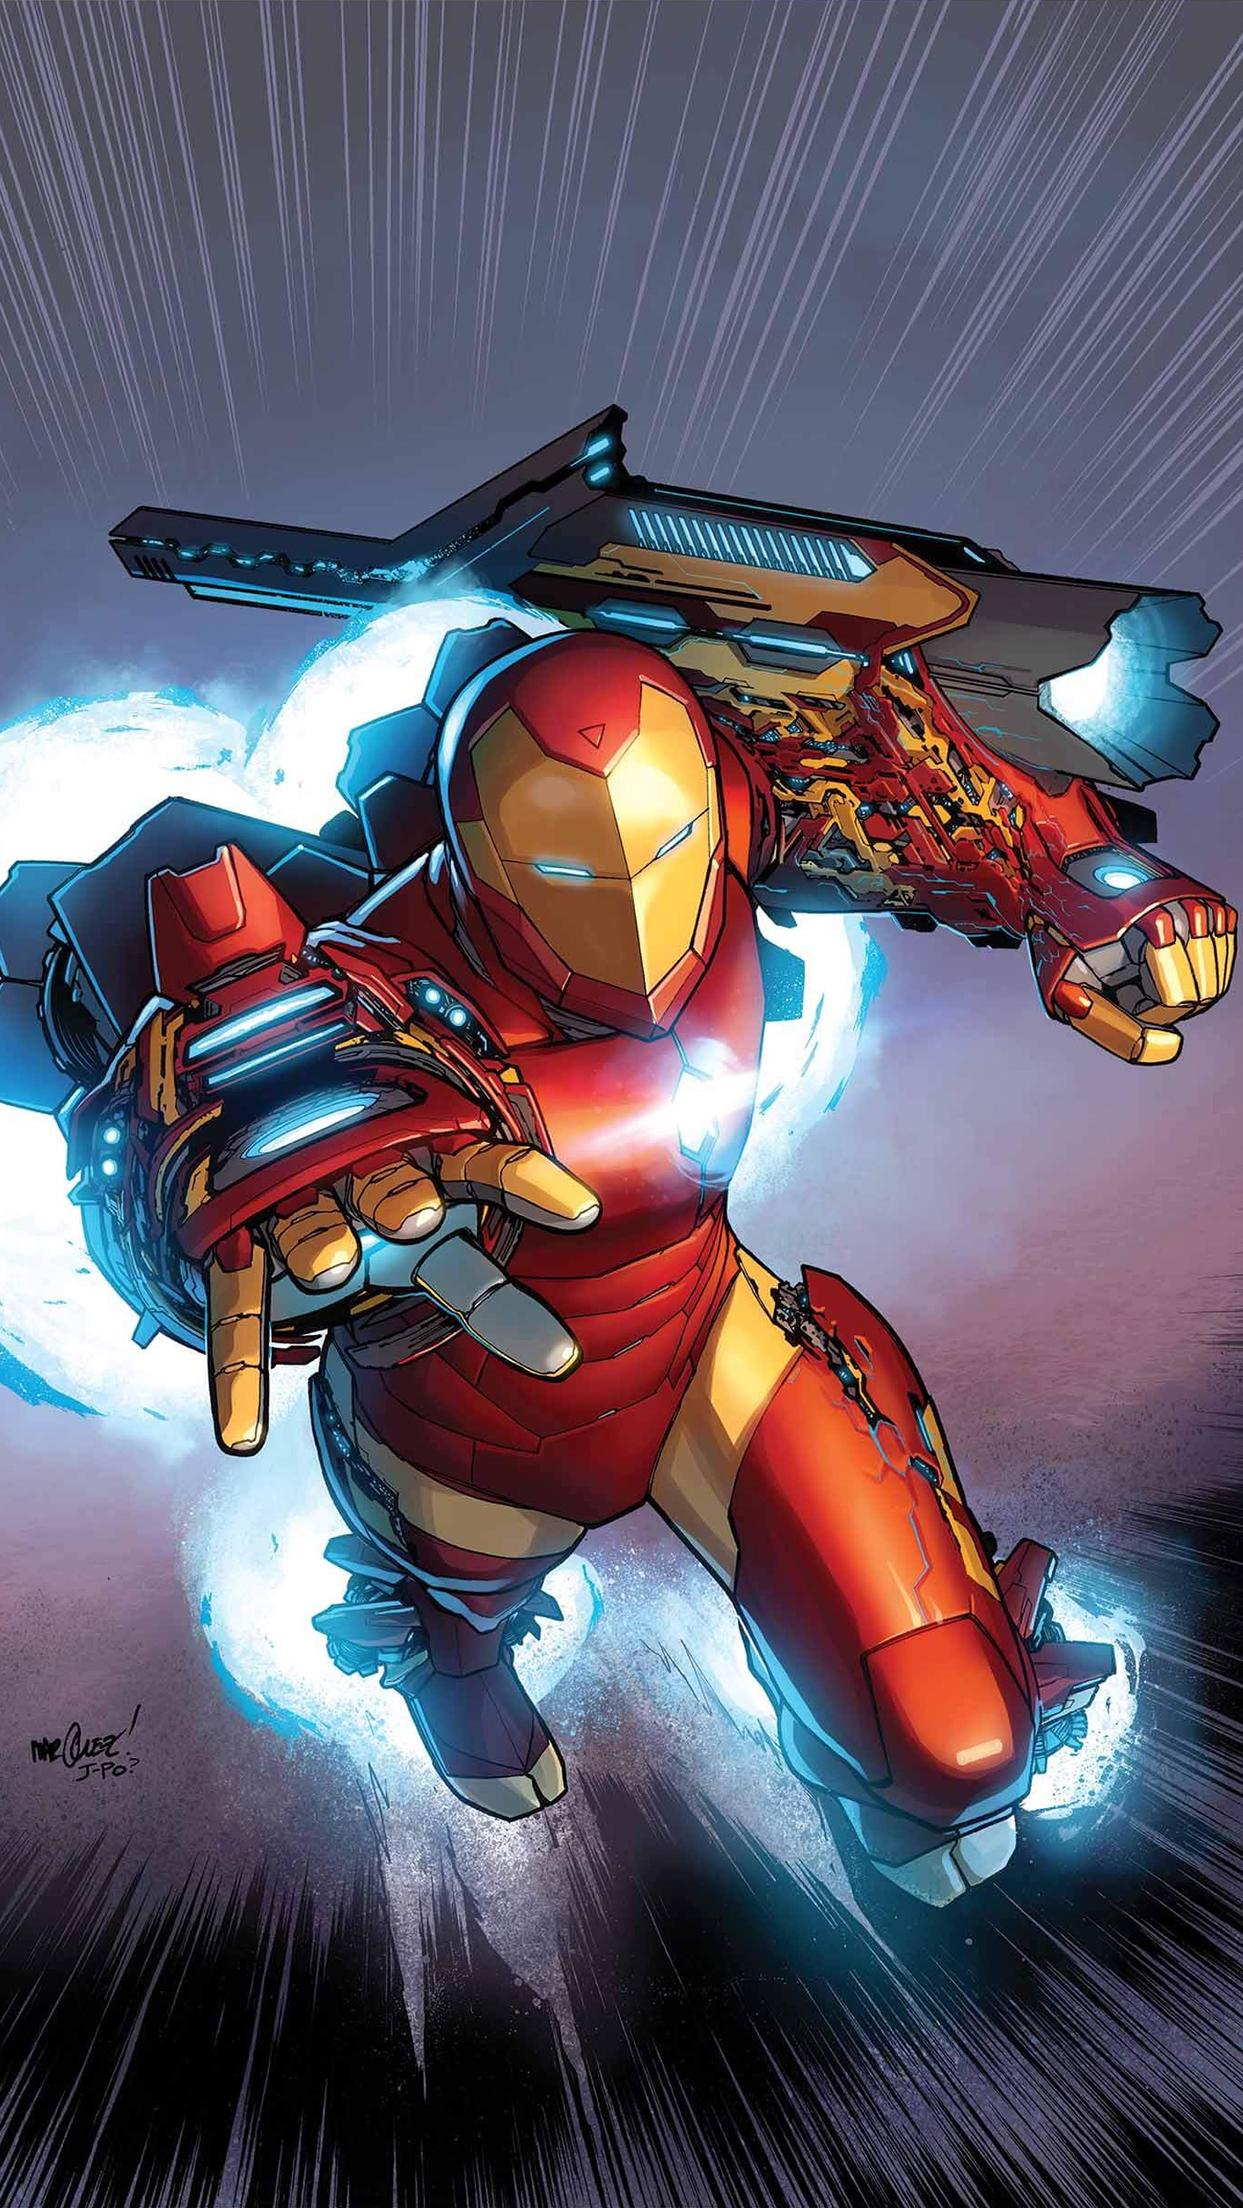 Iron Man Cartoon Wallpaper For Iphone X 8 7 6 Free Download